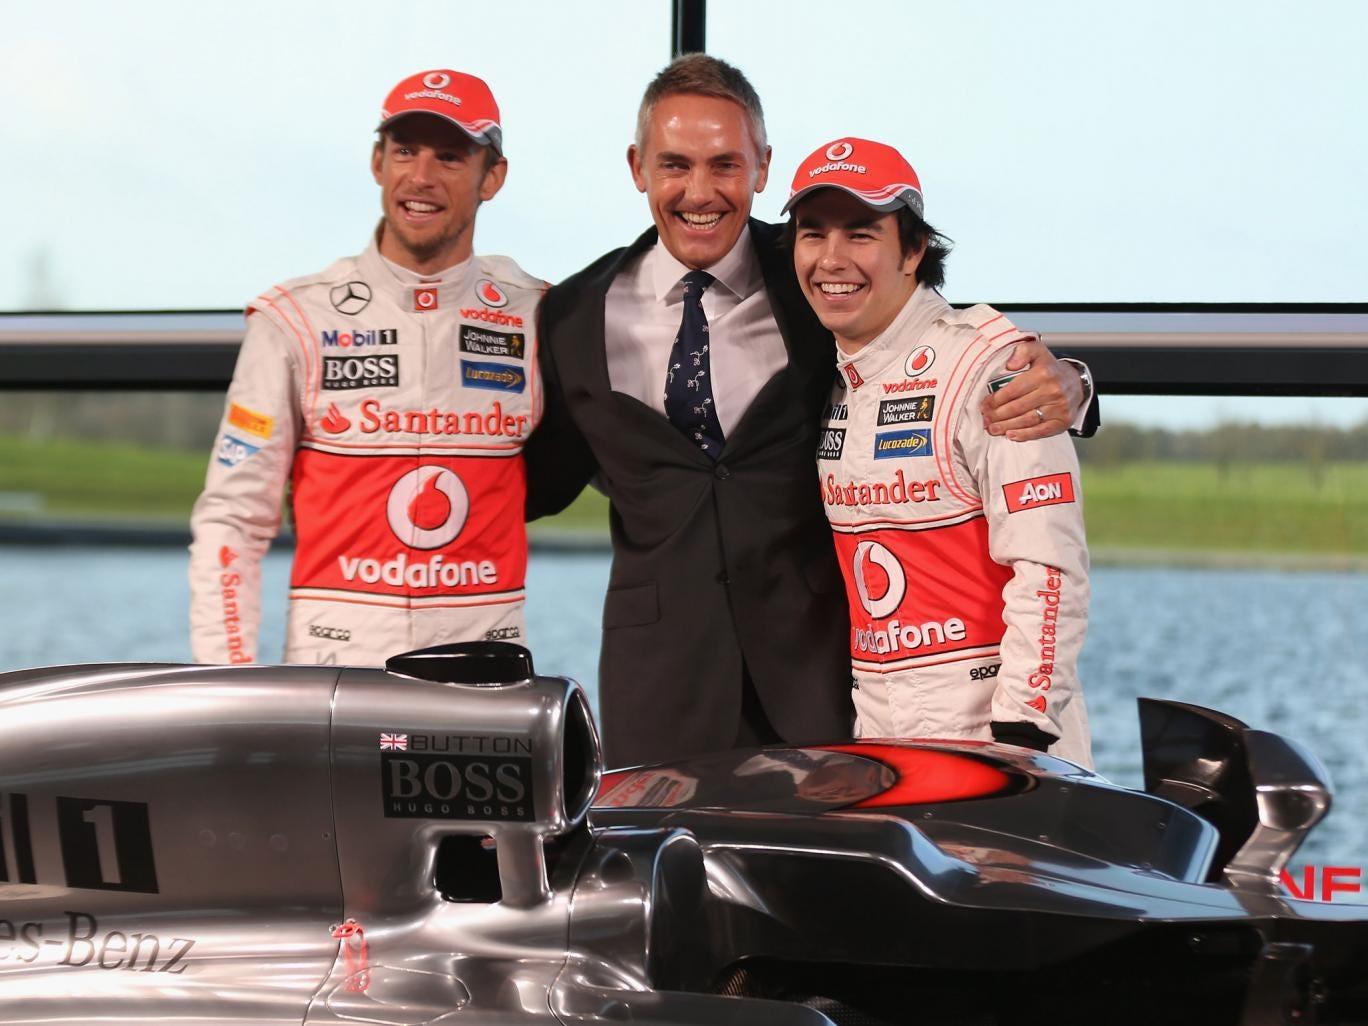 McLaren Mercedes Formula 1 drivers Jenson Button (L) of Great Britain and Sergio Perez (R) of Mexico